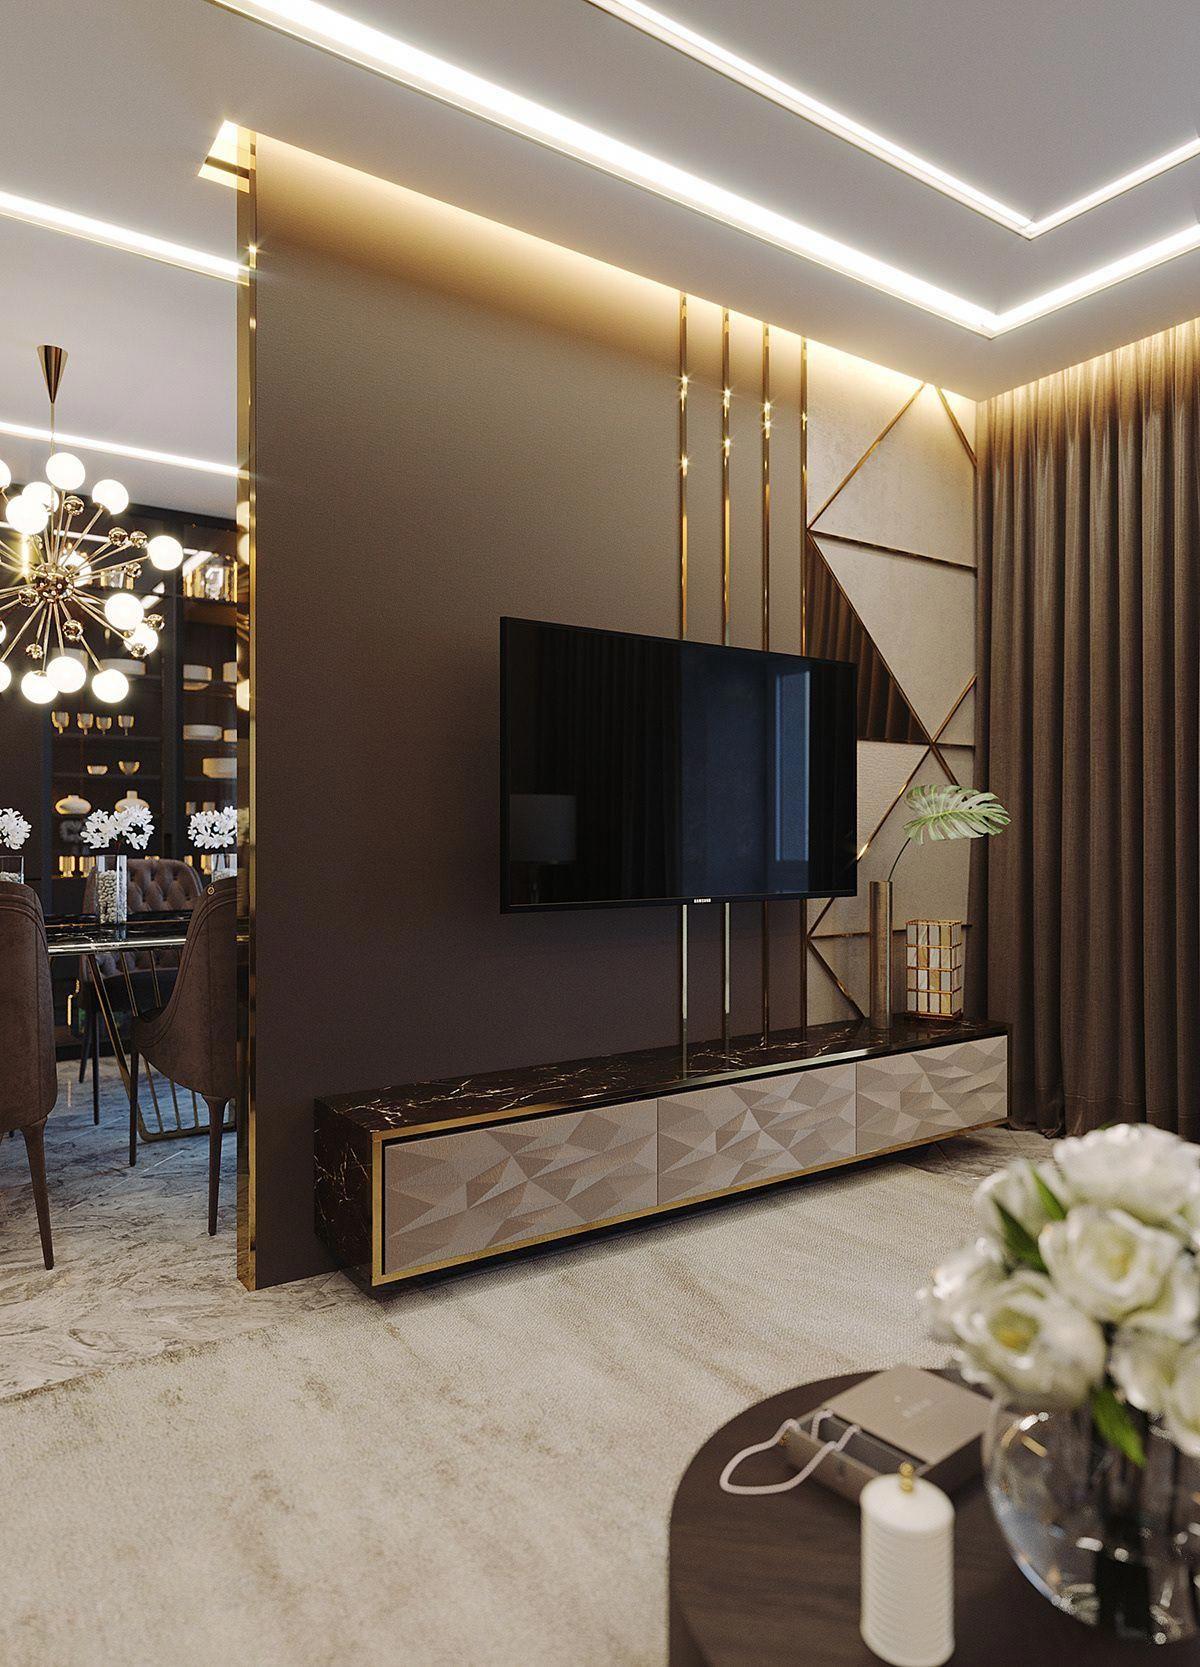 Modern Tv Units Living Room Tv Unit Modern: Marvelous Warm Living Room #warmlivingroom